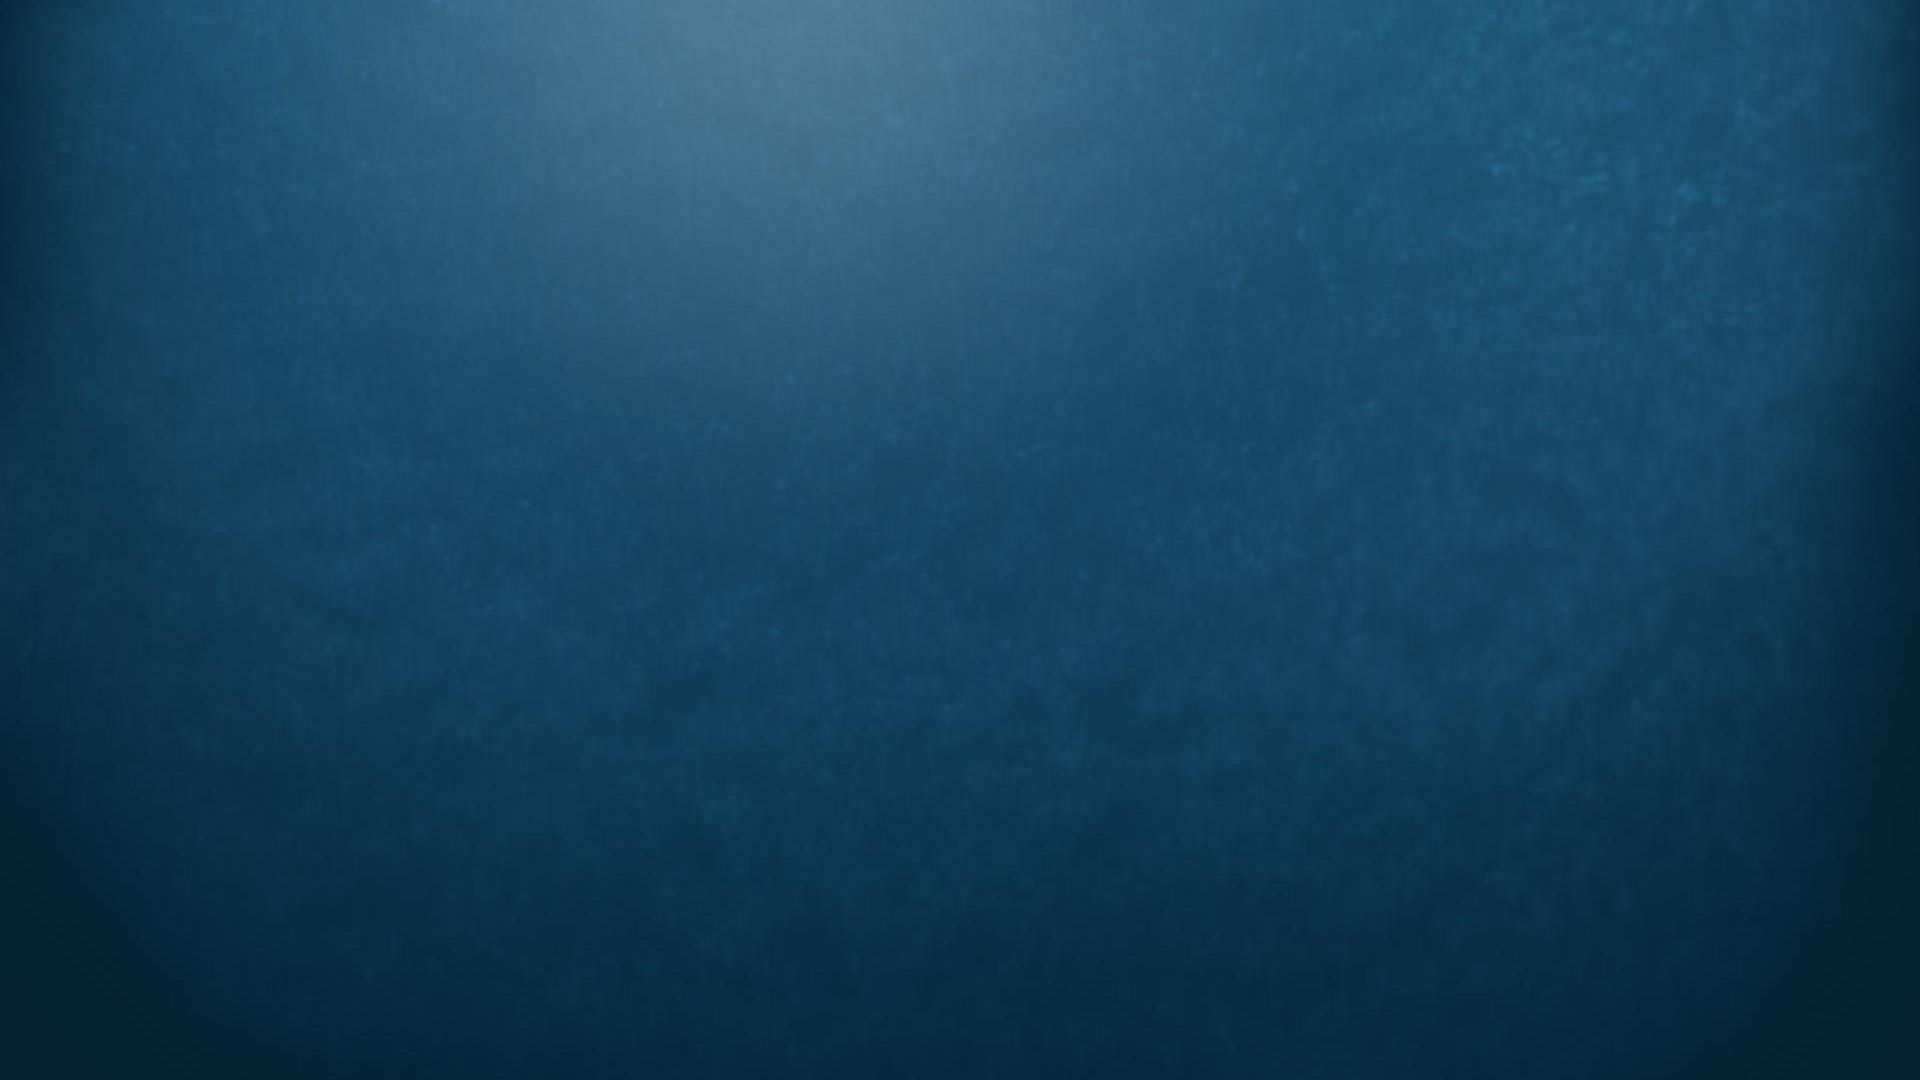 1920x1080 Plain Blue Background Wallpaper